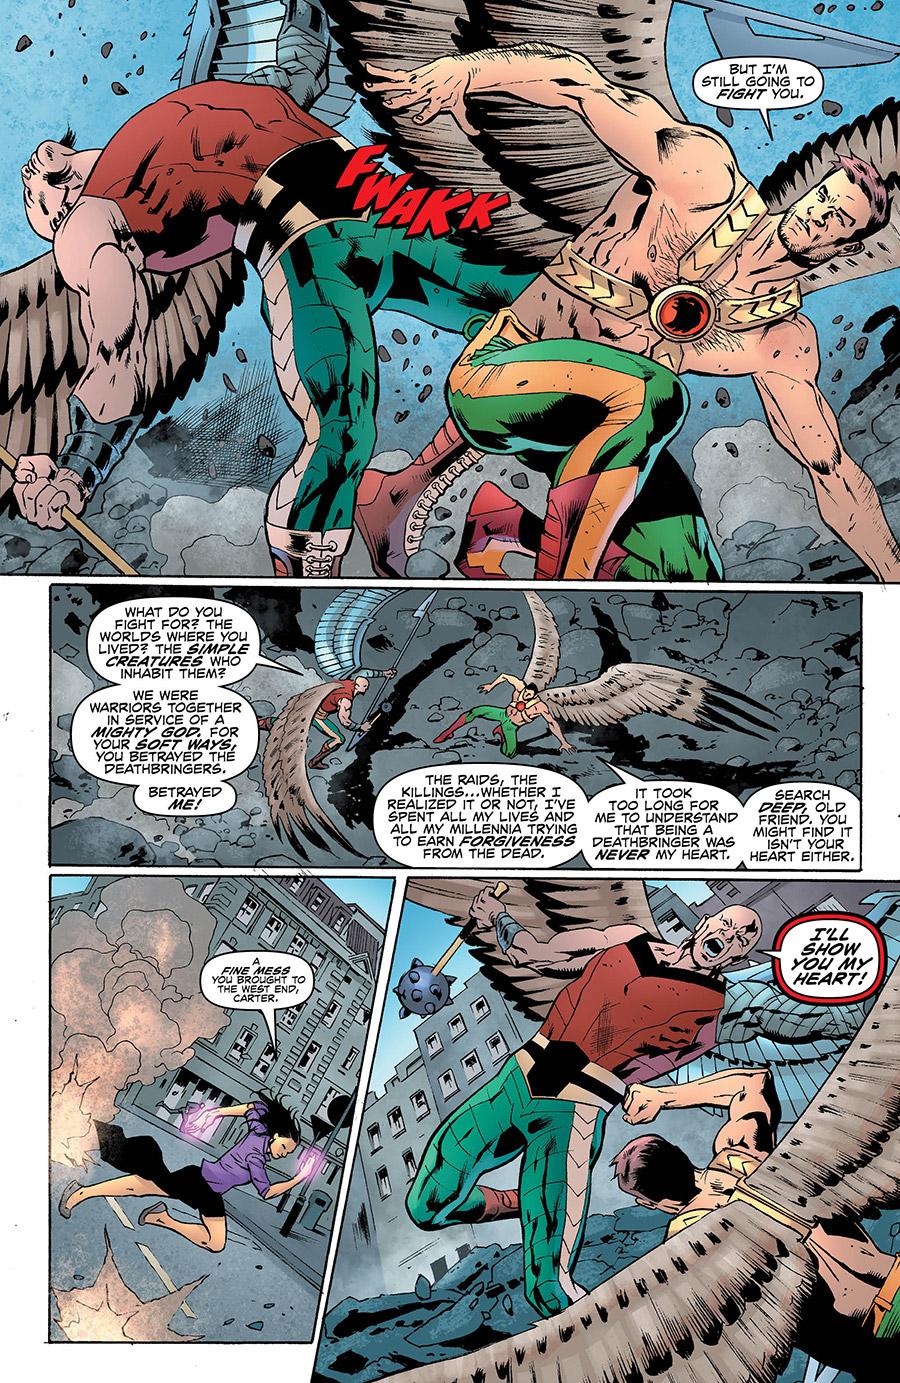 Hawkman 10_3 - DC Comics News